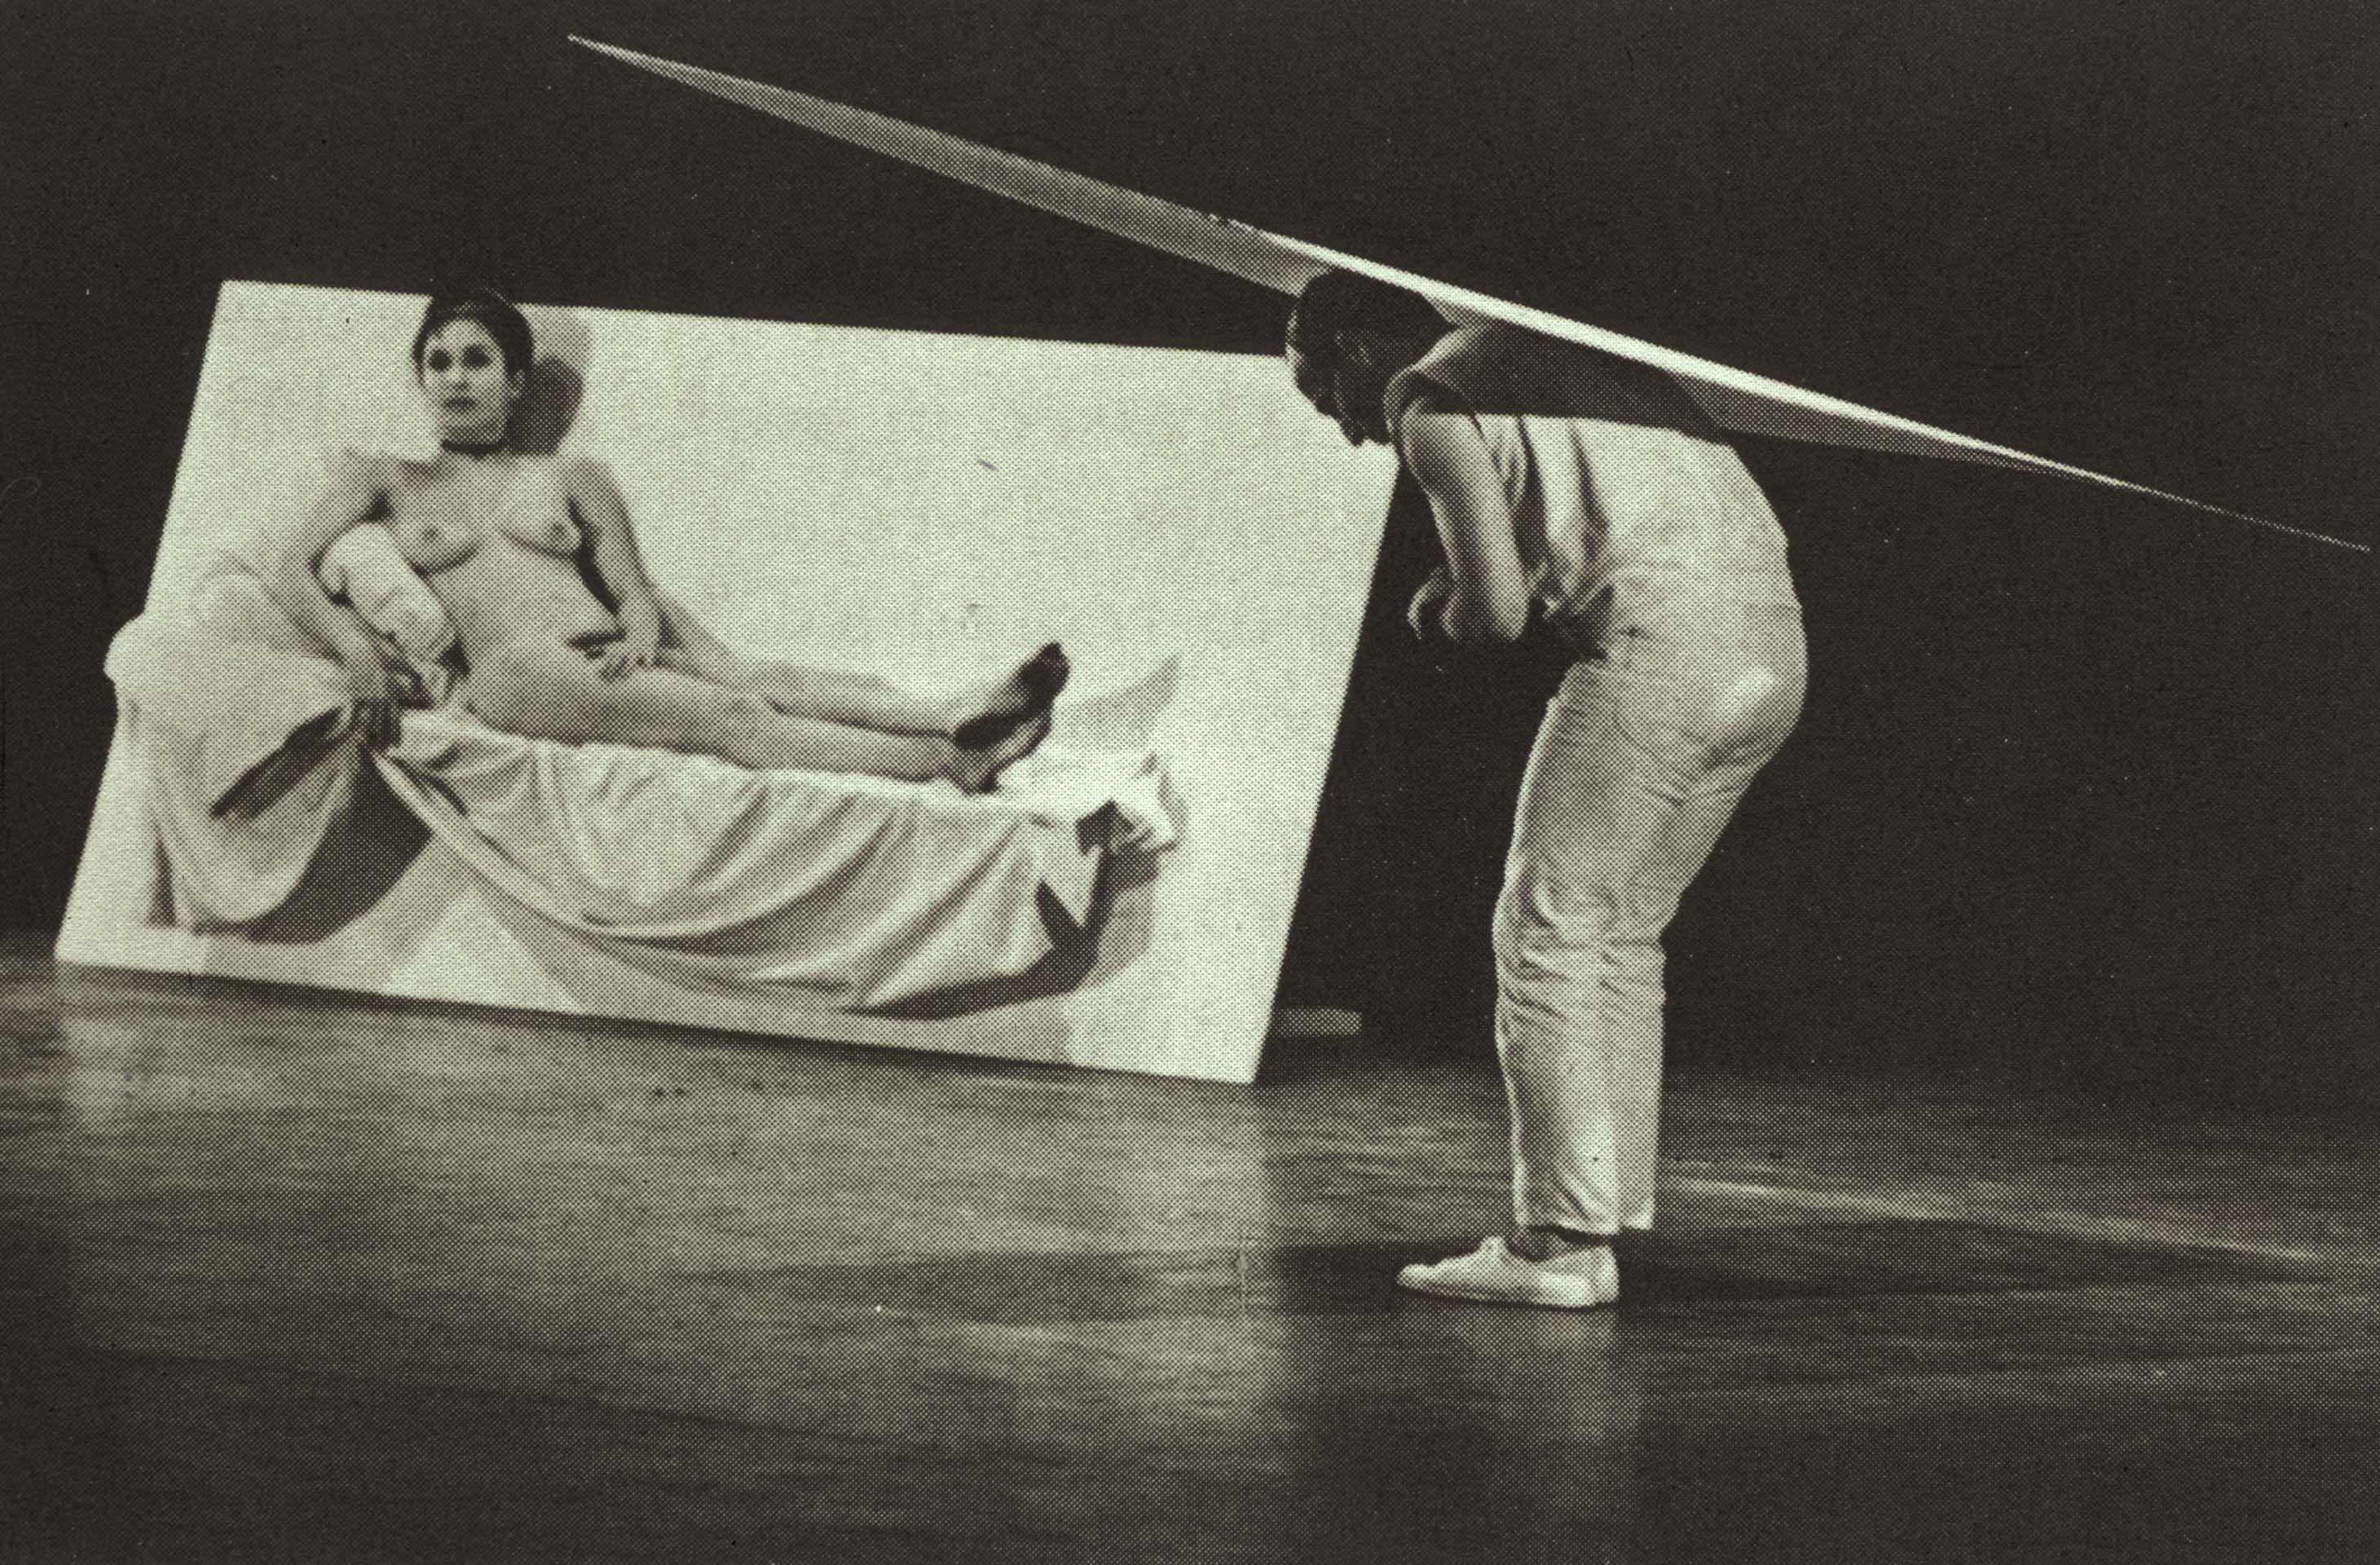 Robert Morris and Carolee Schneemann, Site, 1964